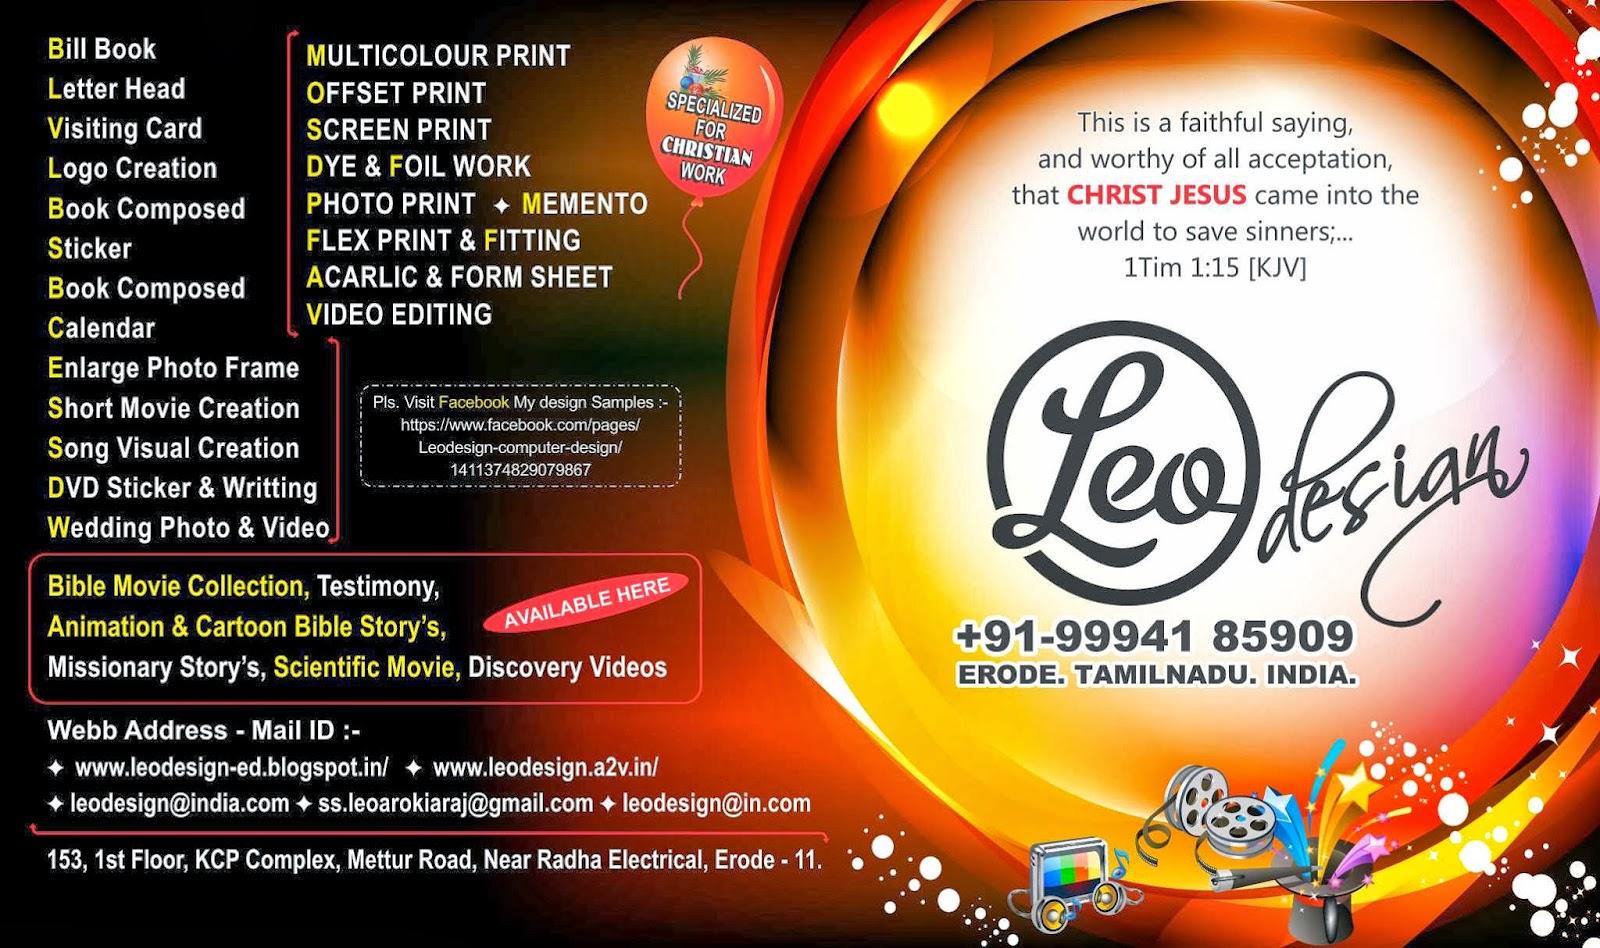 Leodesign Bill Book Design And PrintBill DesignJob Card